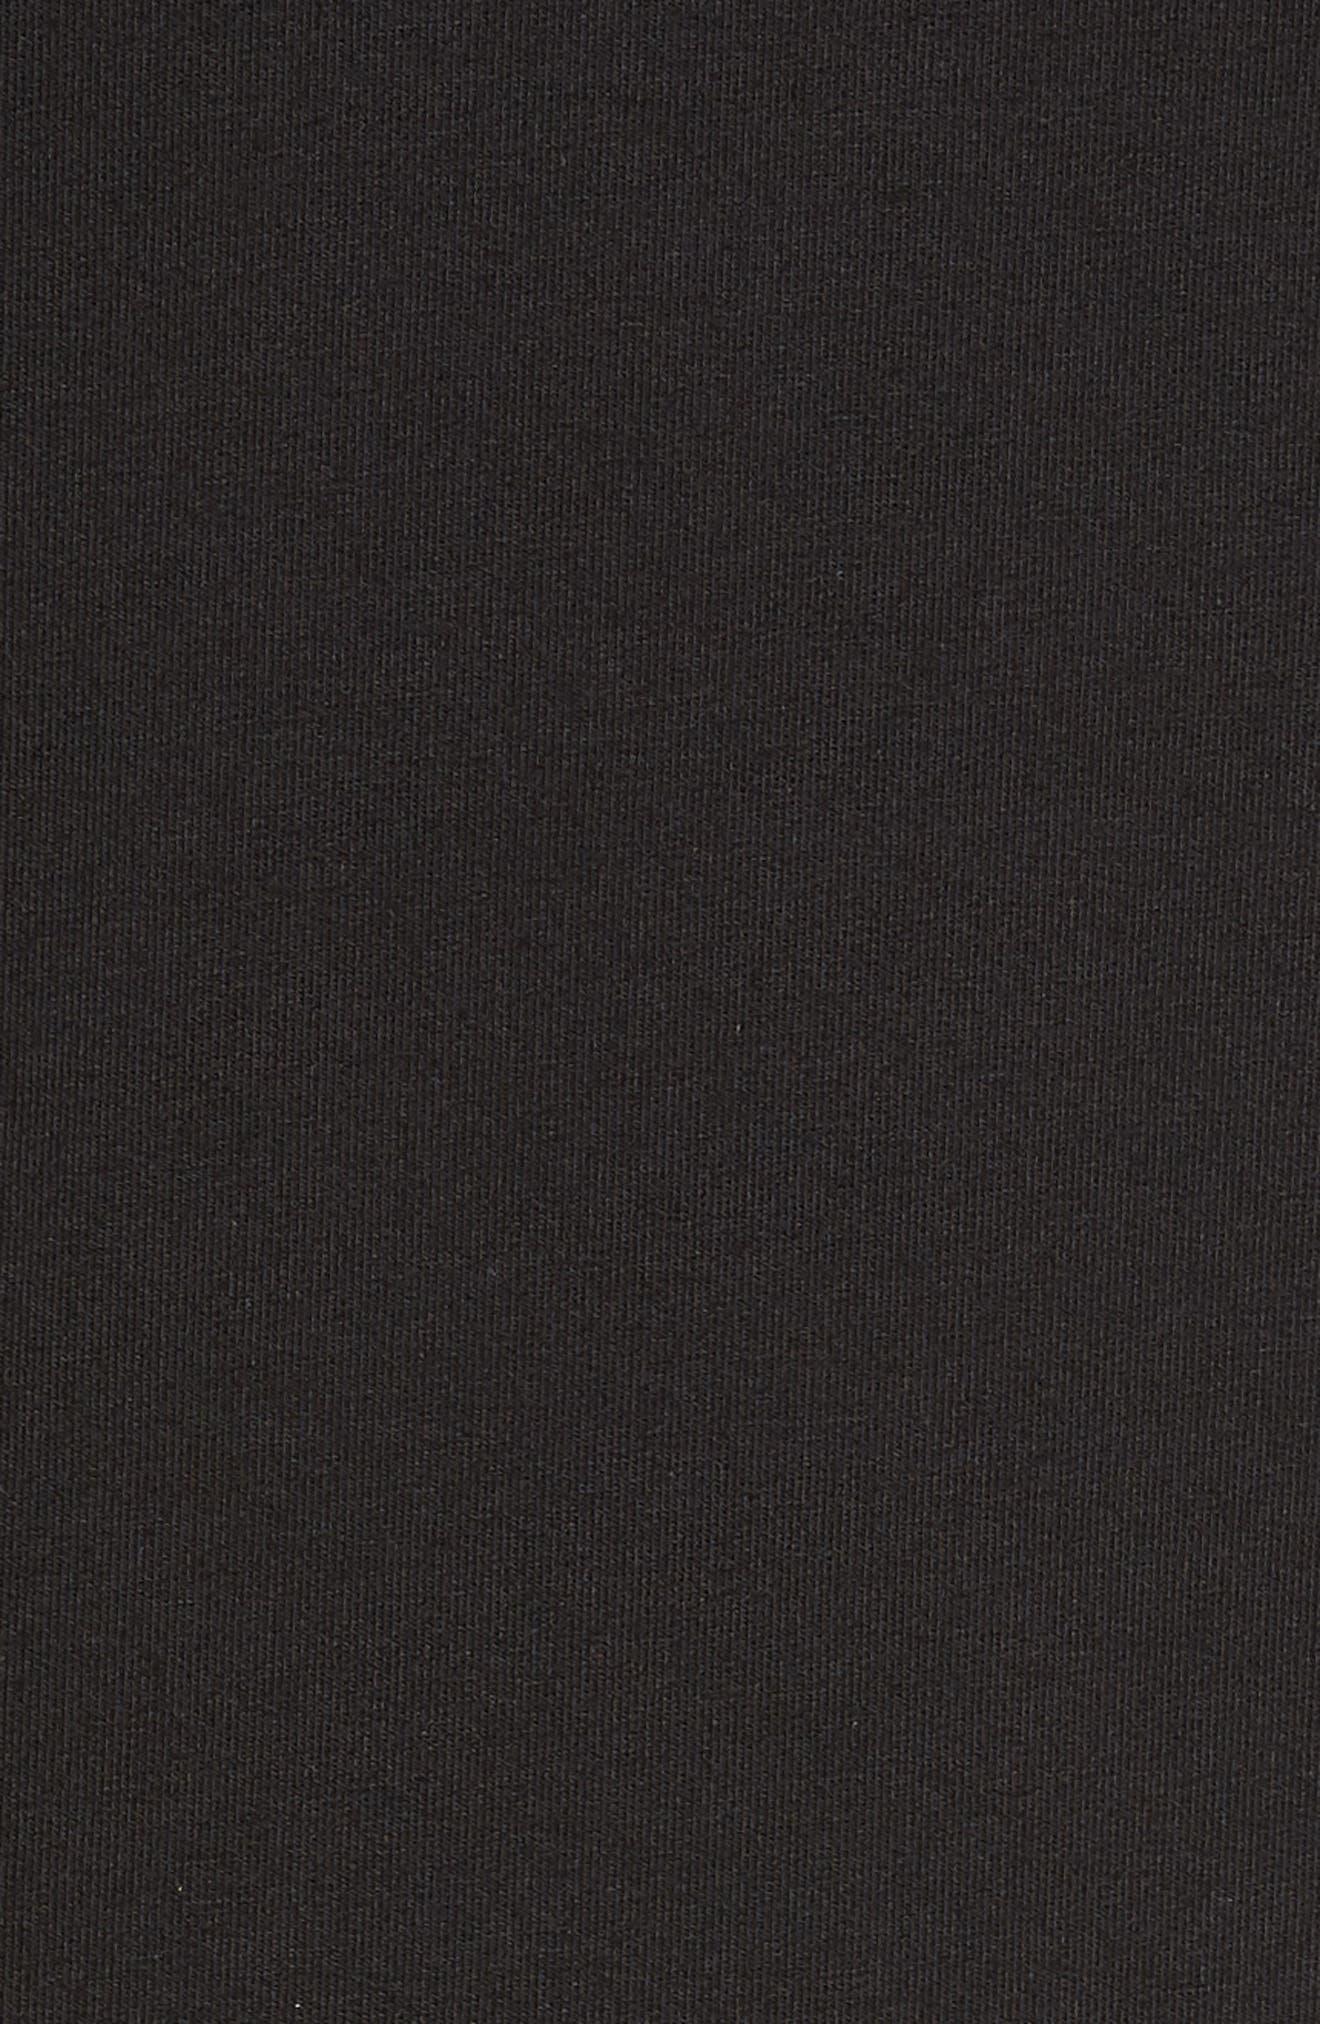 Ruffle Detail Knit Dress,                             Alternate thumbnail 13, color,